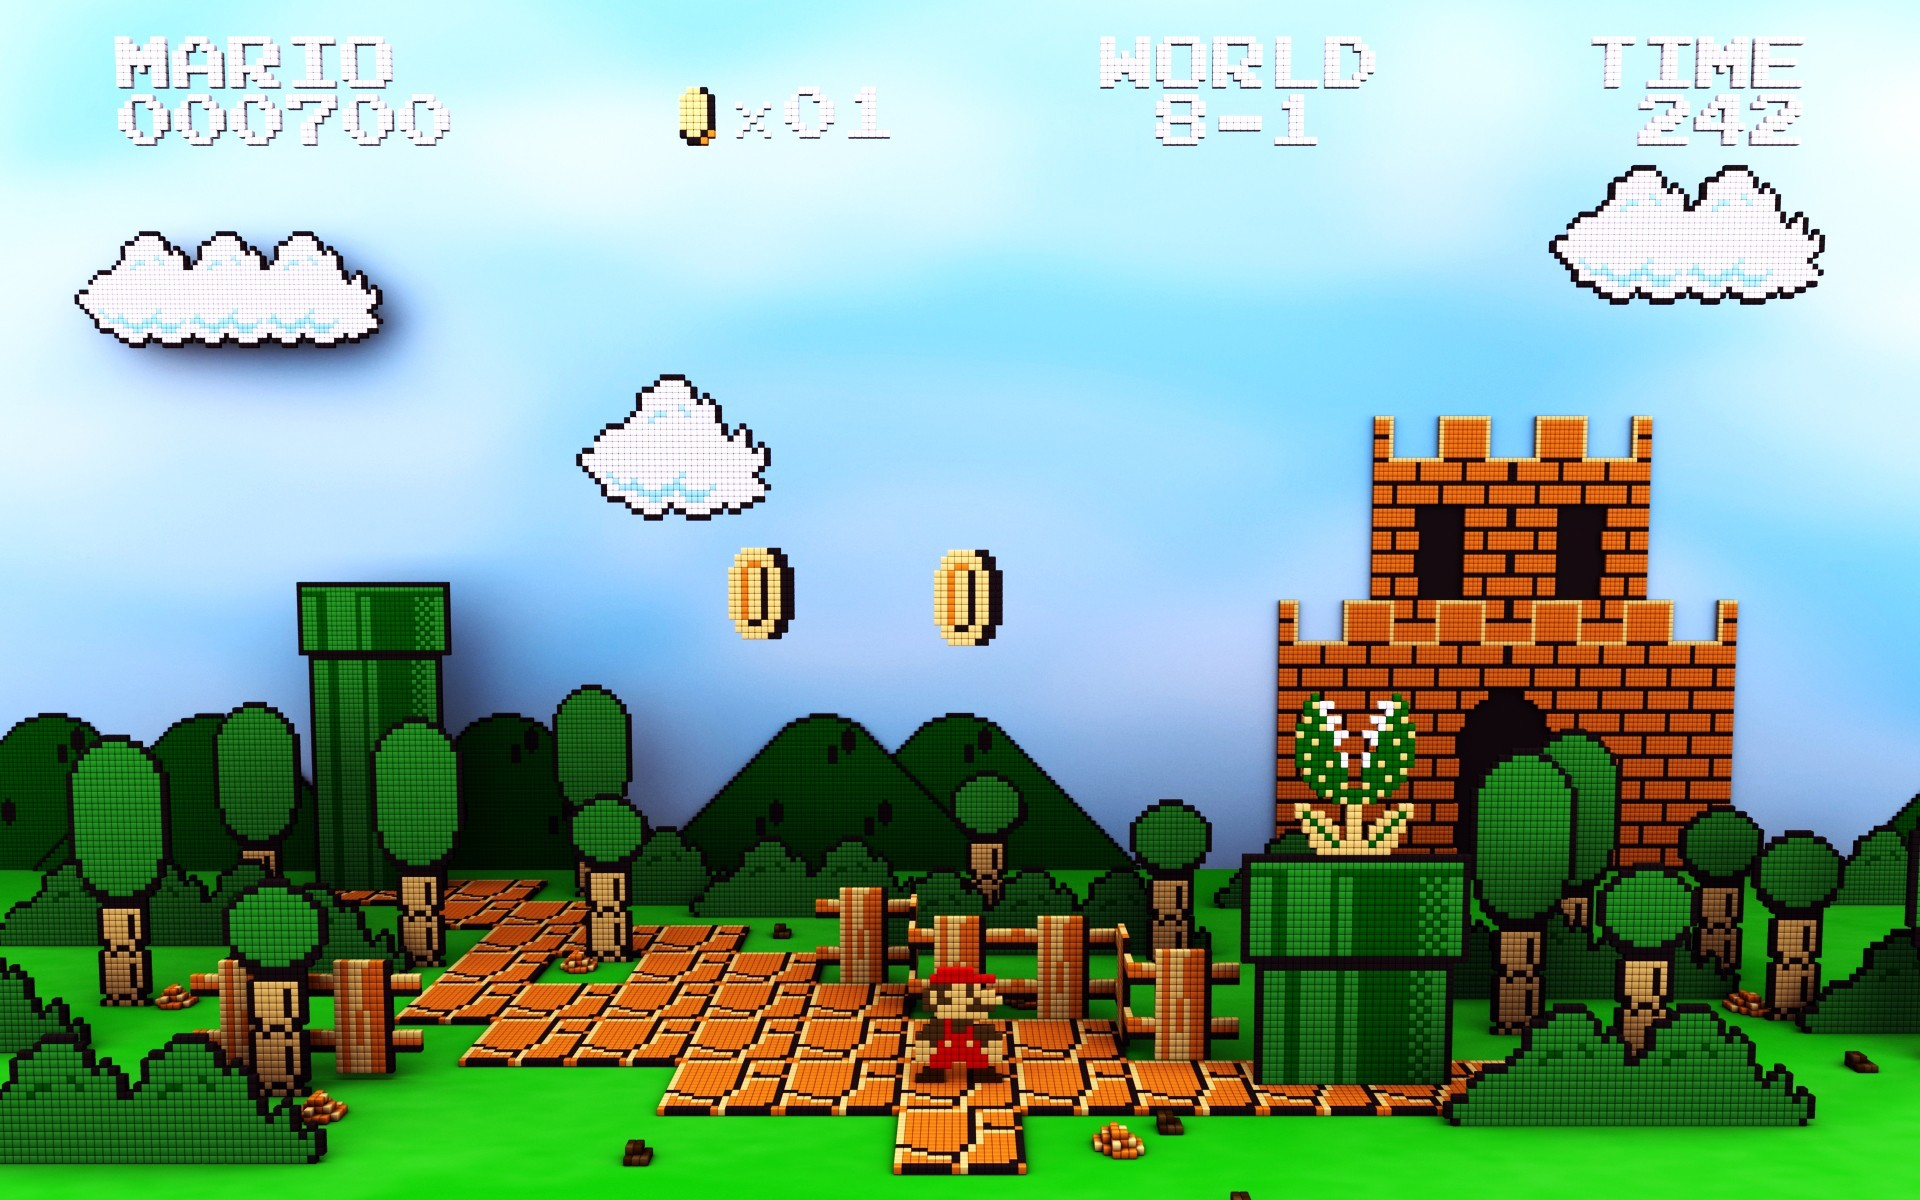 Mario Bros., Retro Games, Nintendo Entertainment System, Pixel Art, 8 bit,  Video Games Wallpapers HD / Desktop and Mobile Backgrounds